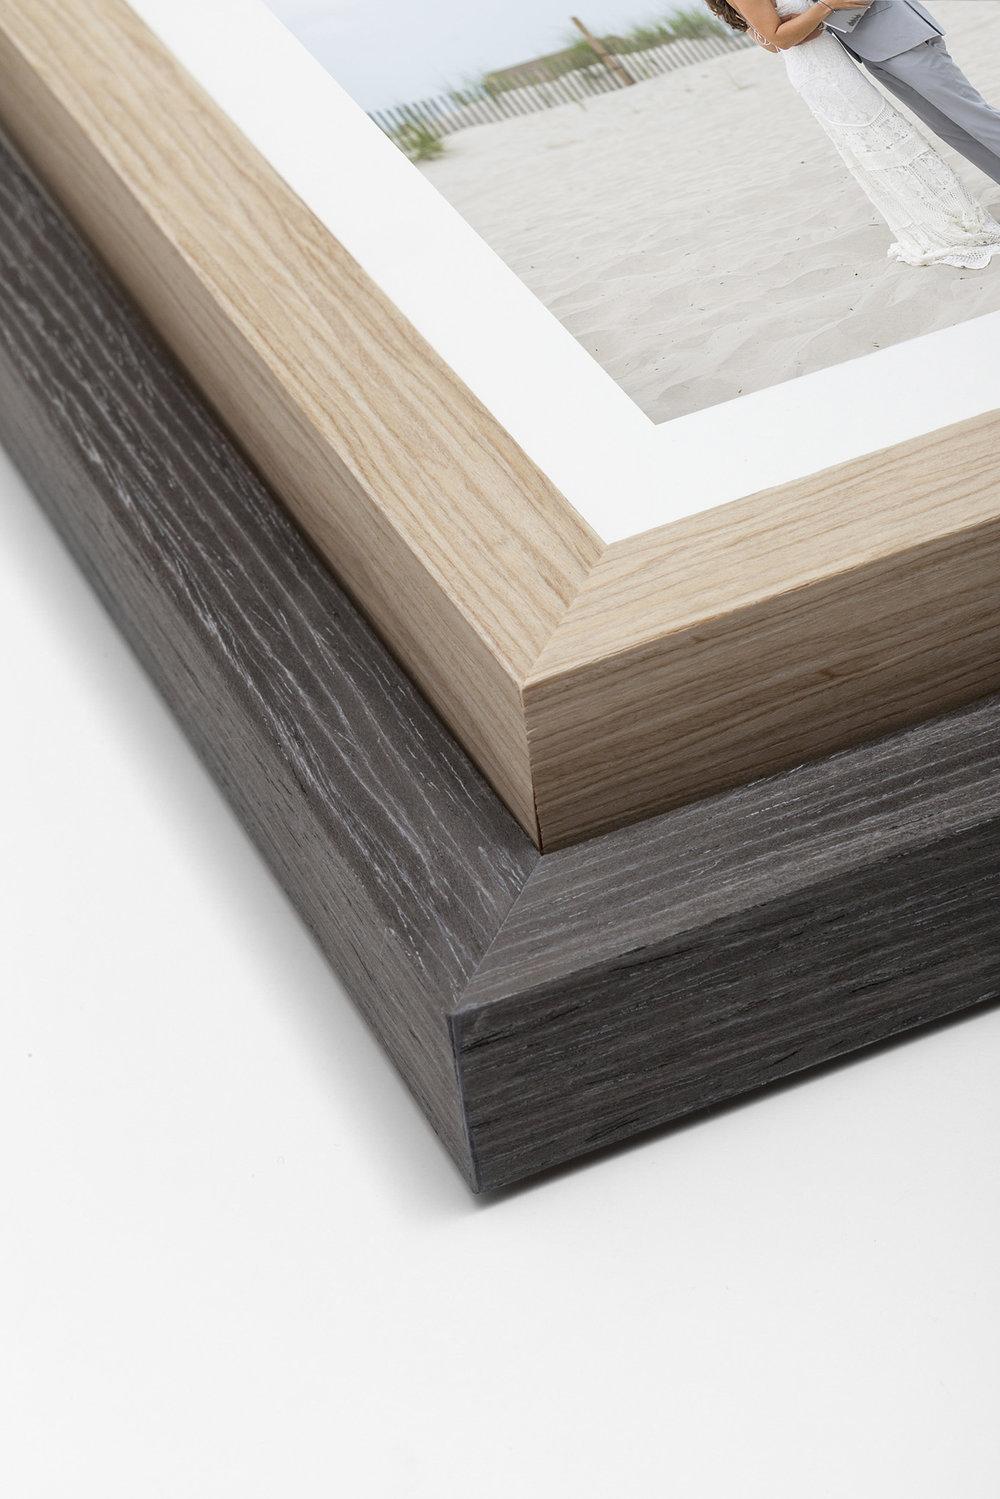 natural_wood_queensberry_frames_stack.jpg